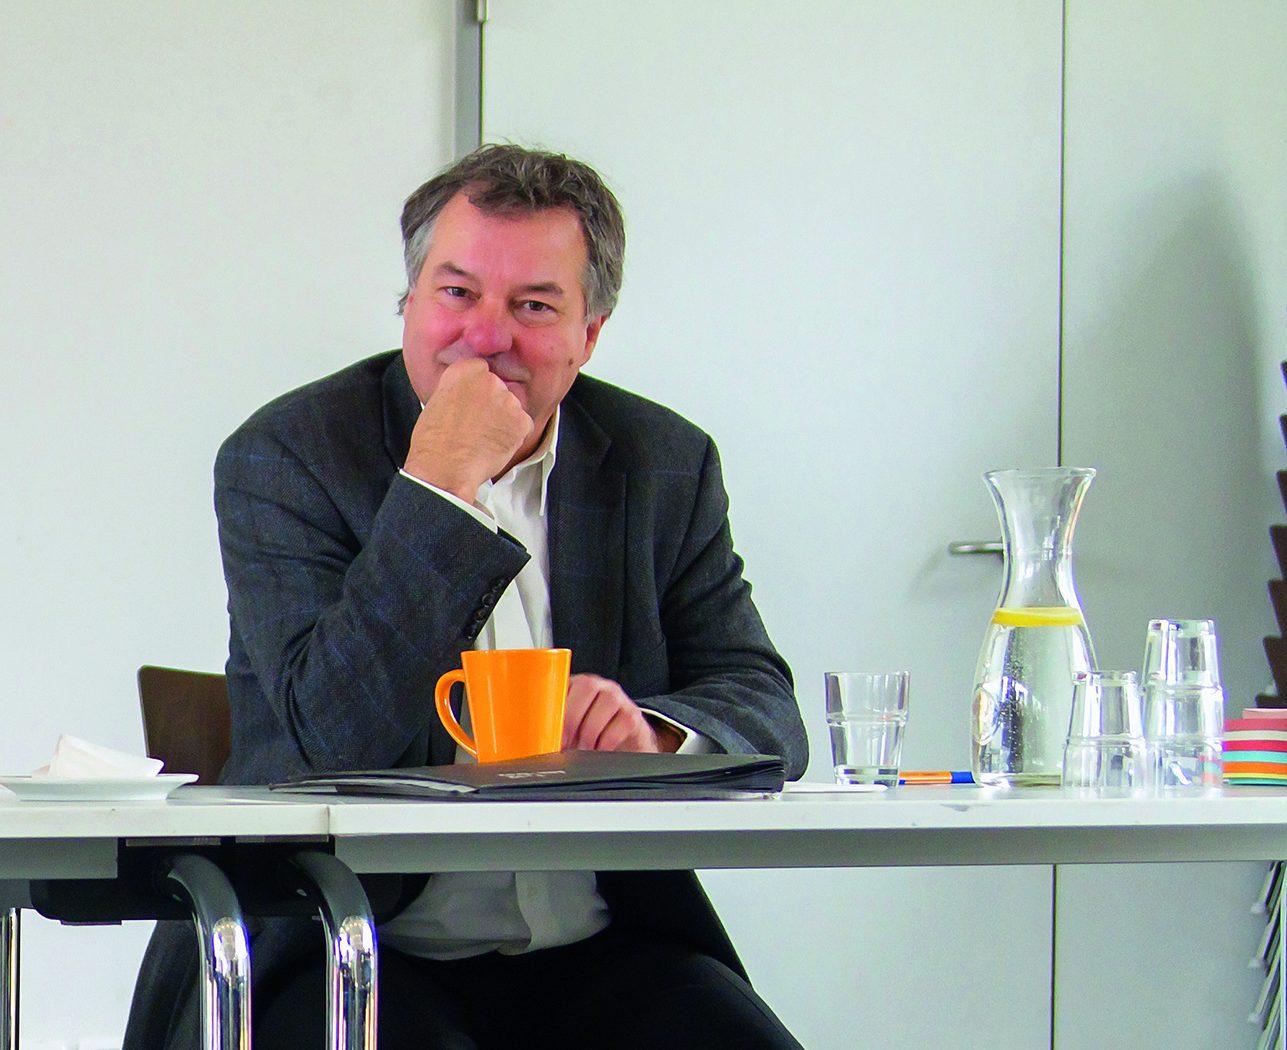 Mann sitzt af Stuhl im Office-Environment